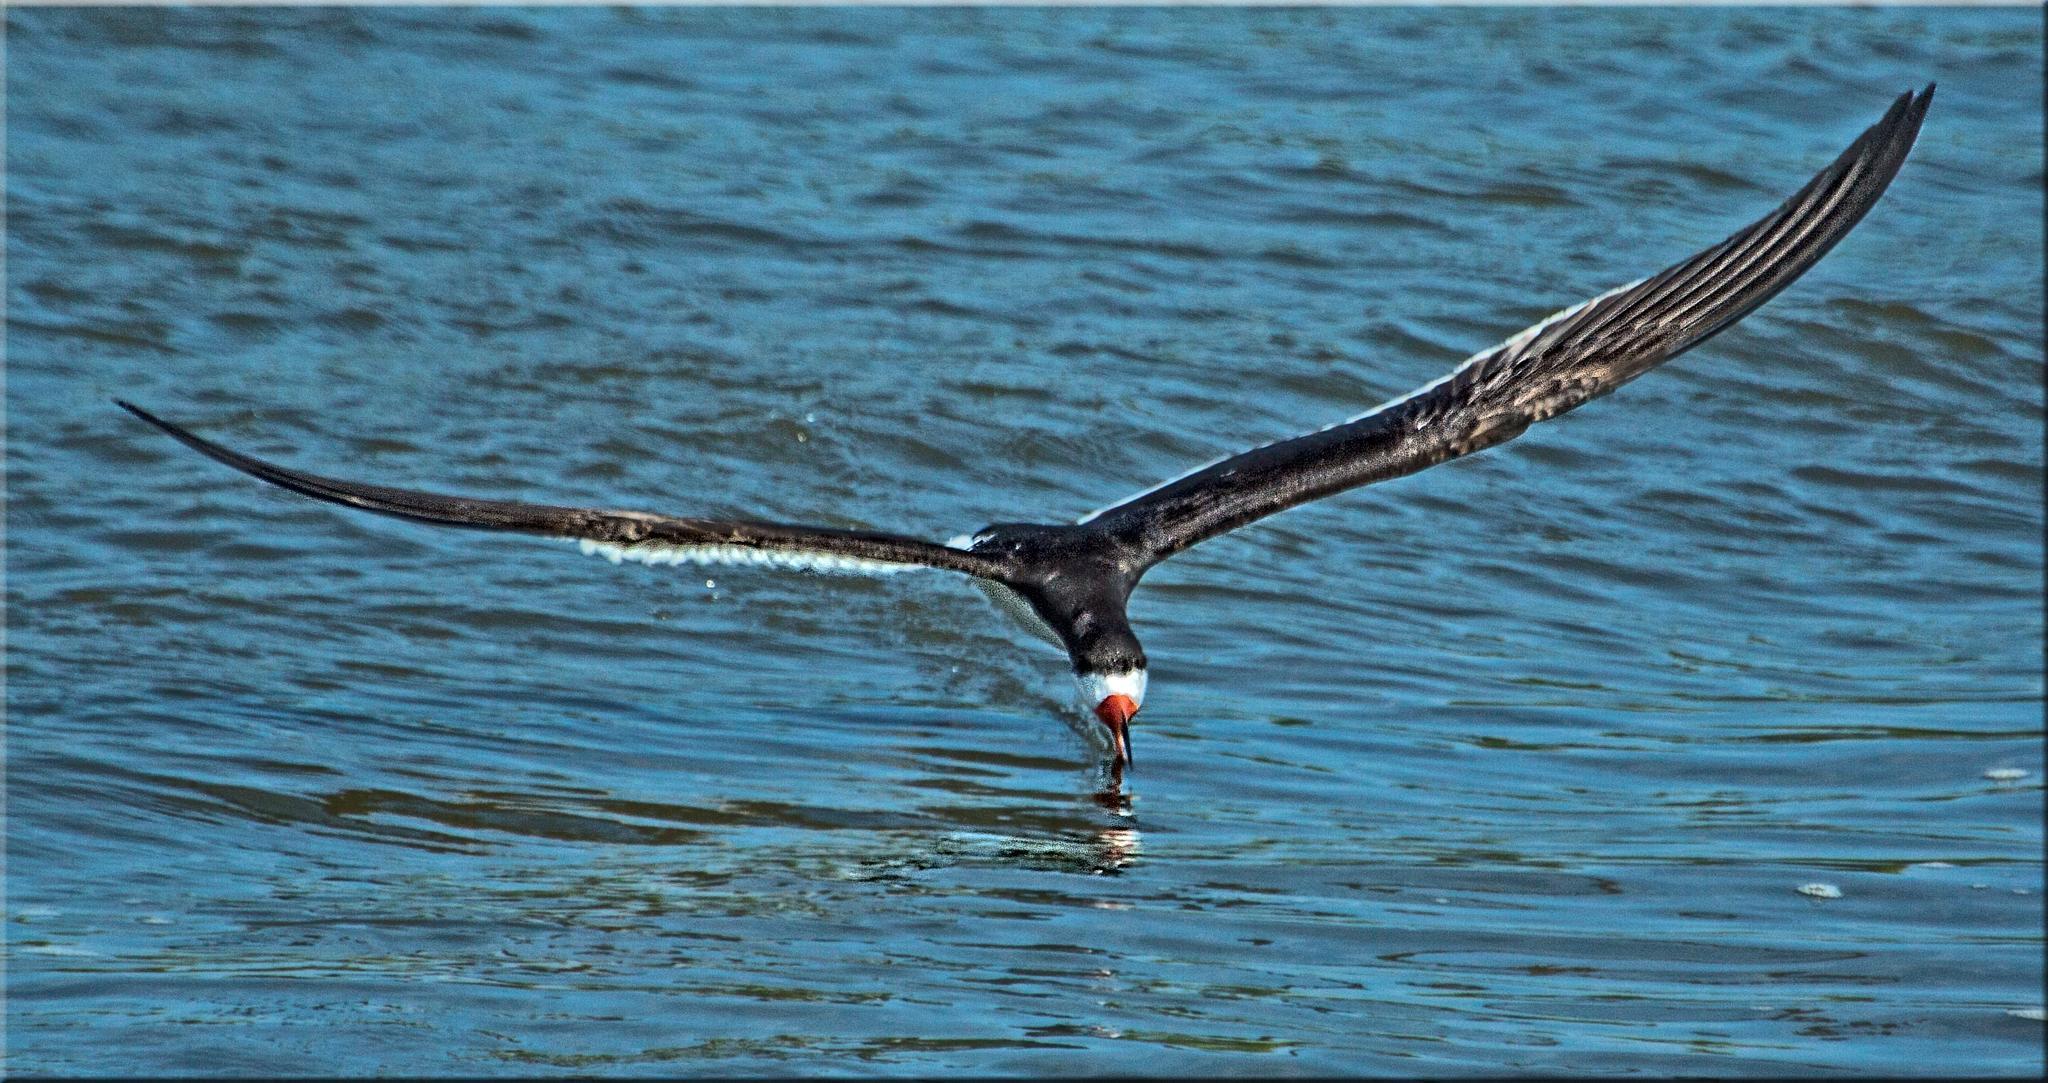 Black Skimmer Skimming by stanlupo